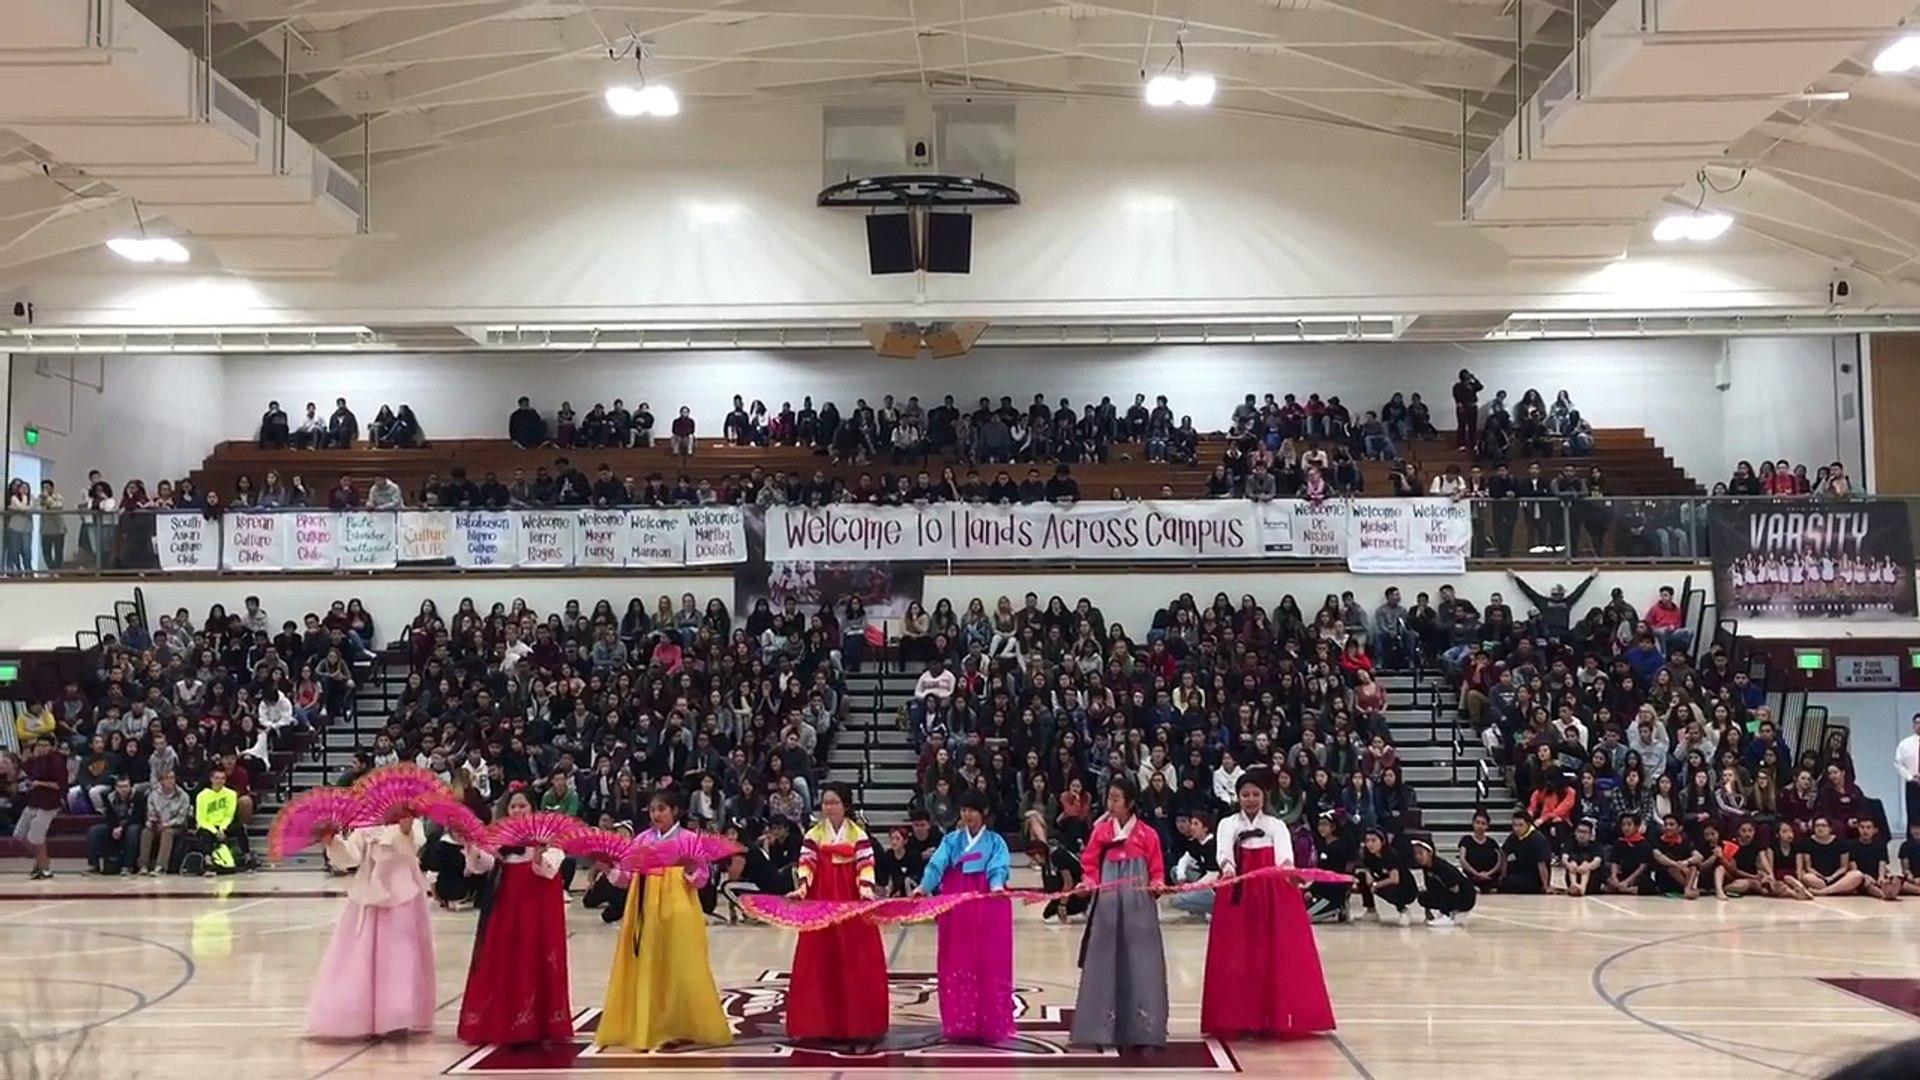 Torrance High School Hands Across Campus 2017 Korean Culture Club (fan dance & K POP)